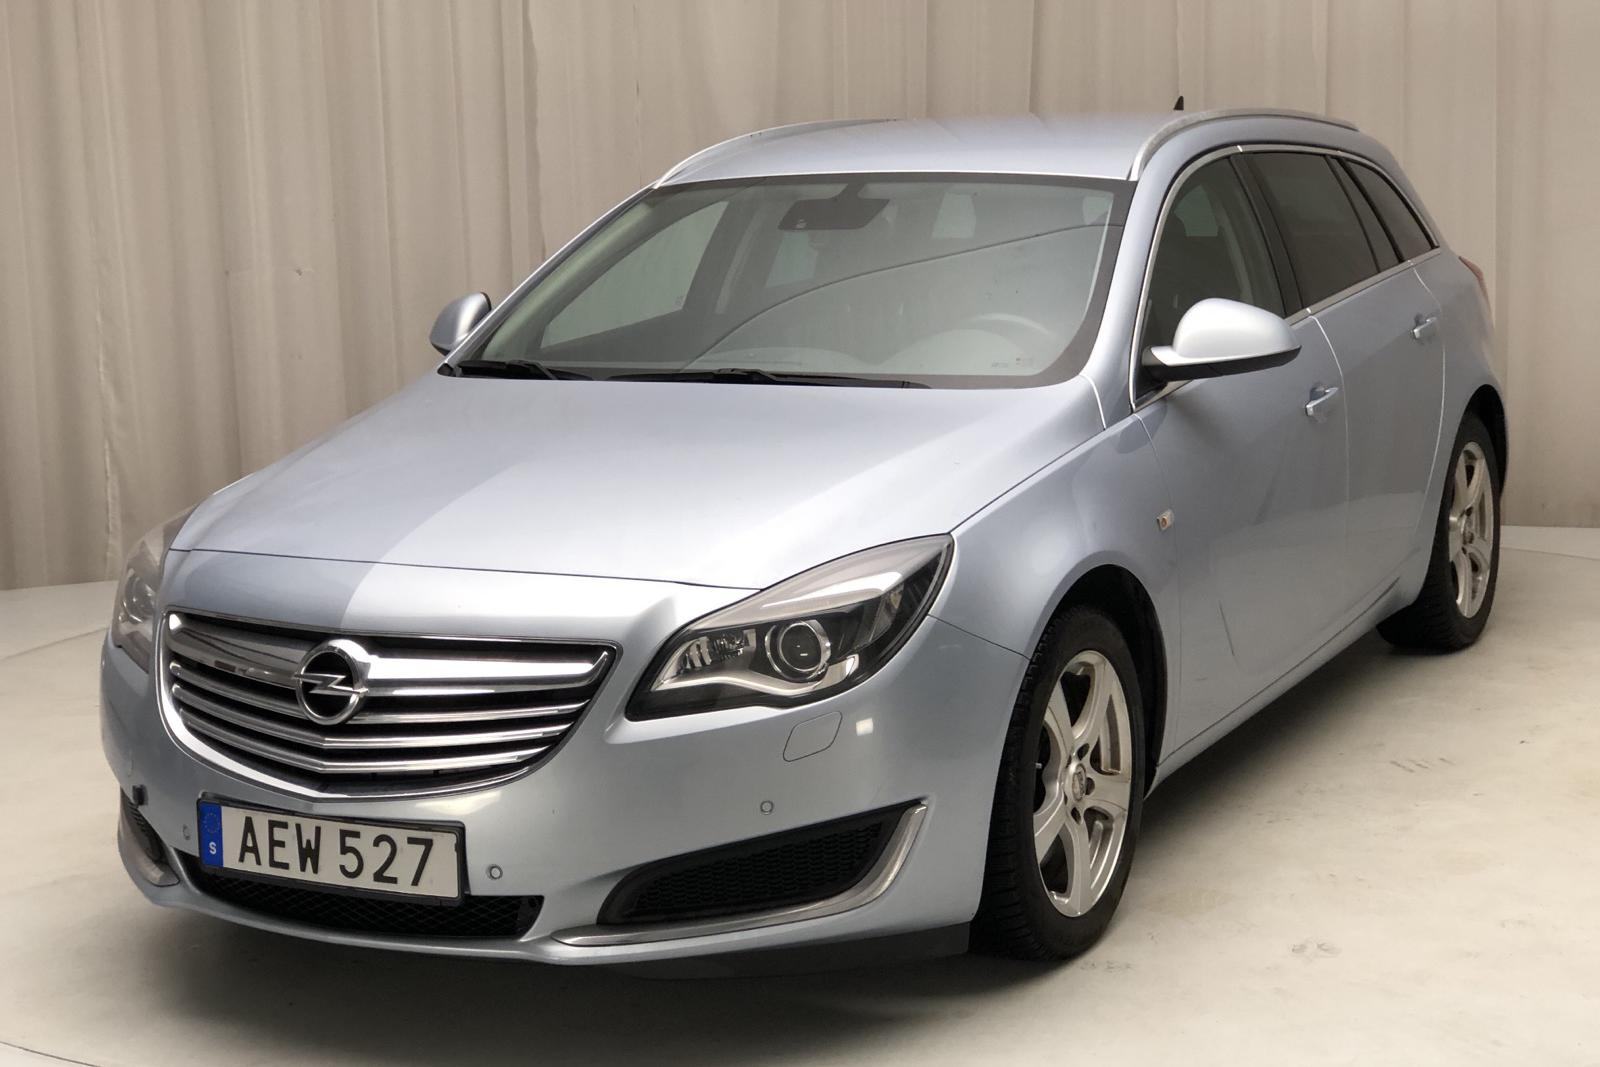 Opel Insignia 2.0 CDTI ecoFLEX Sports Tourer (140hk) - 270 000 km - gray - 2014